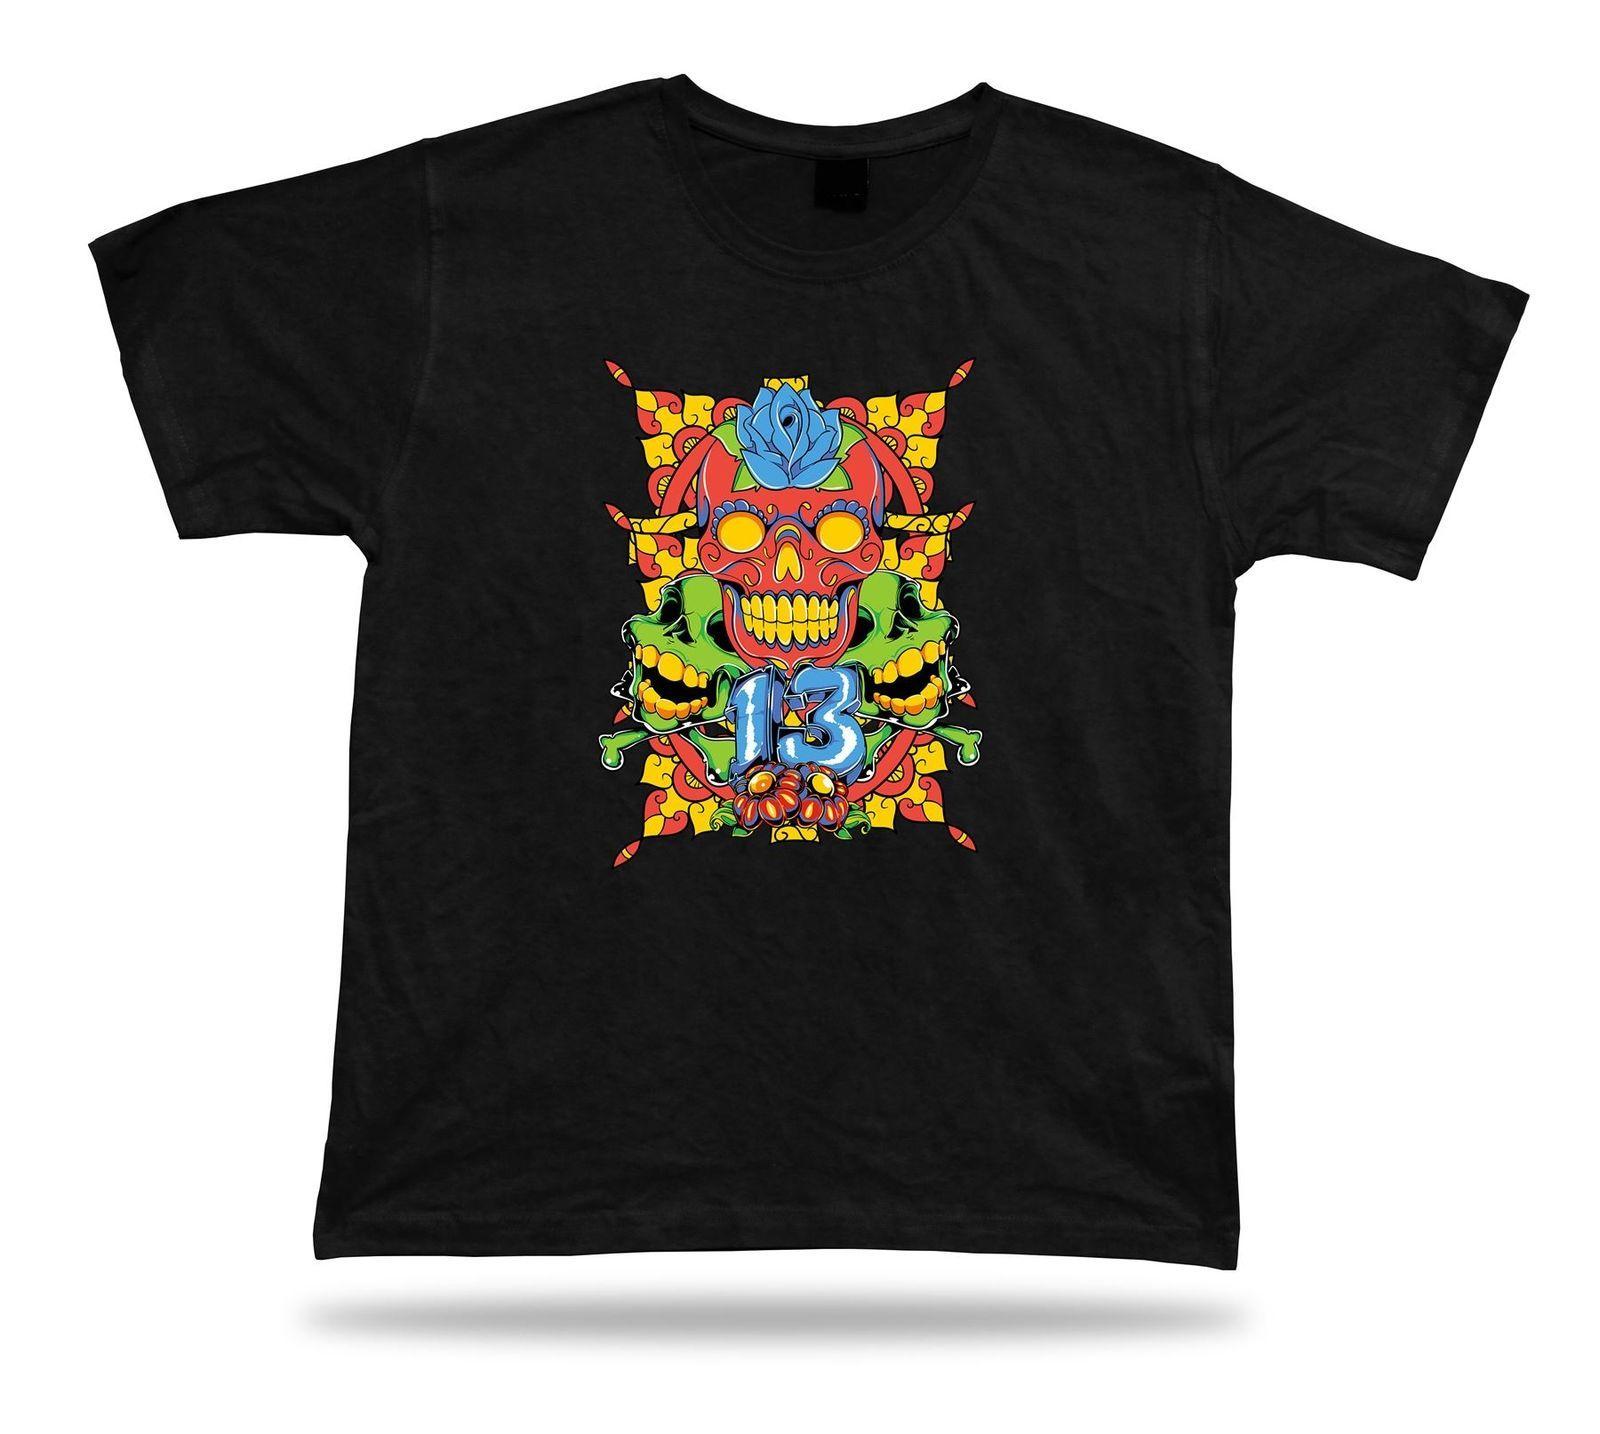 dc97bf5a1 Tshirt Tee Shirt Birthday Gift Idea Good Luck Sugar Colour Jersey Print T  Shirt Jersey Print T Shirt Brand Shirts Jeans Print Tee Shirt Shop Online  One T ...